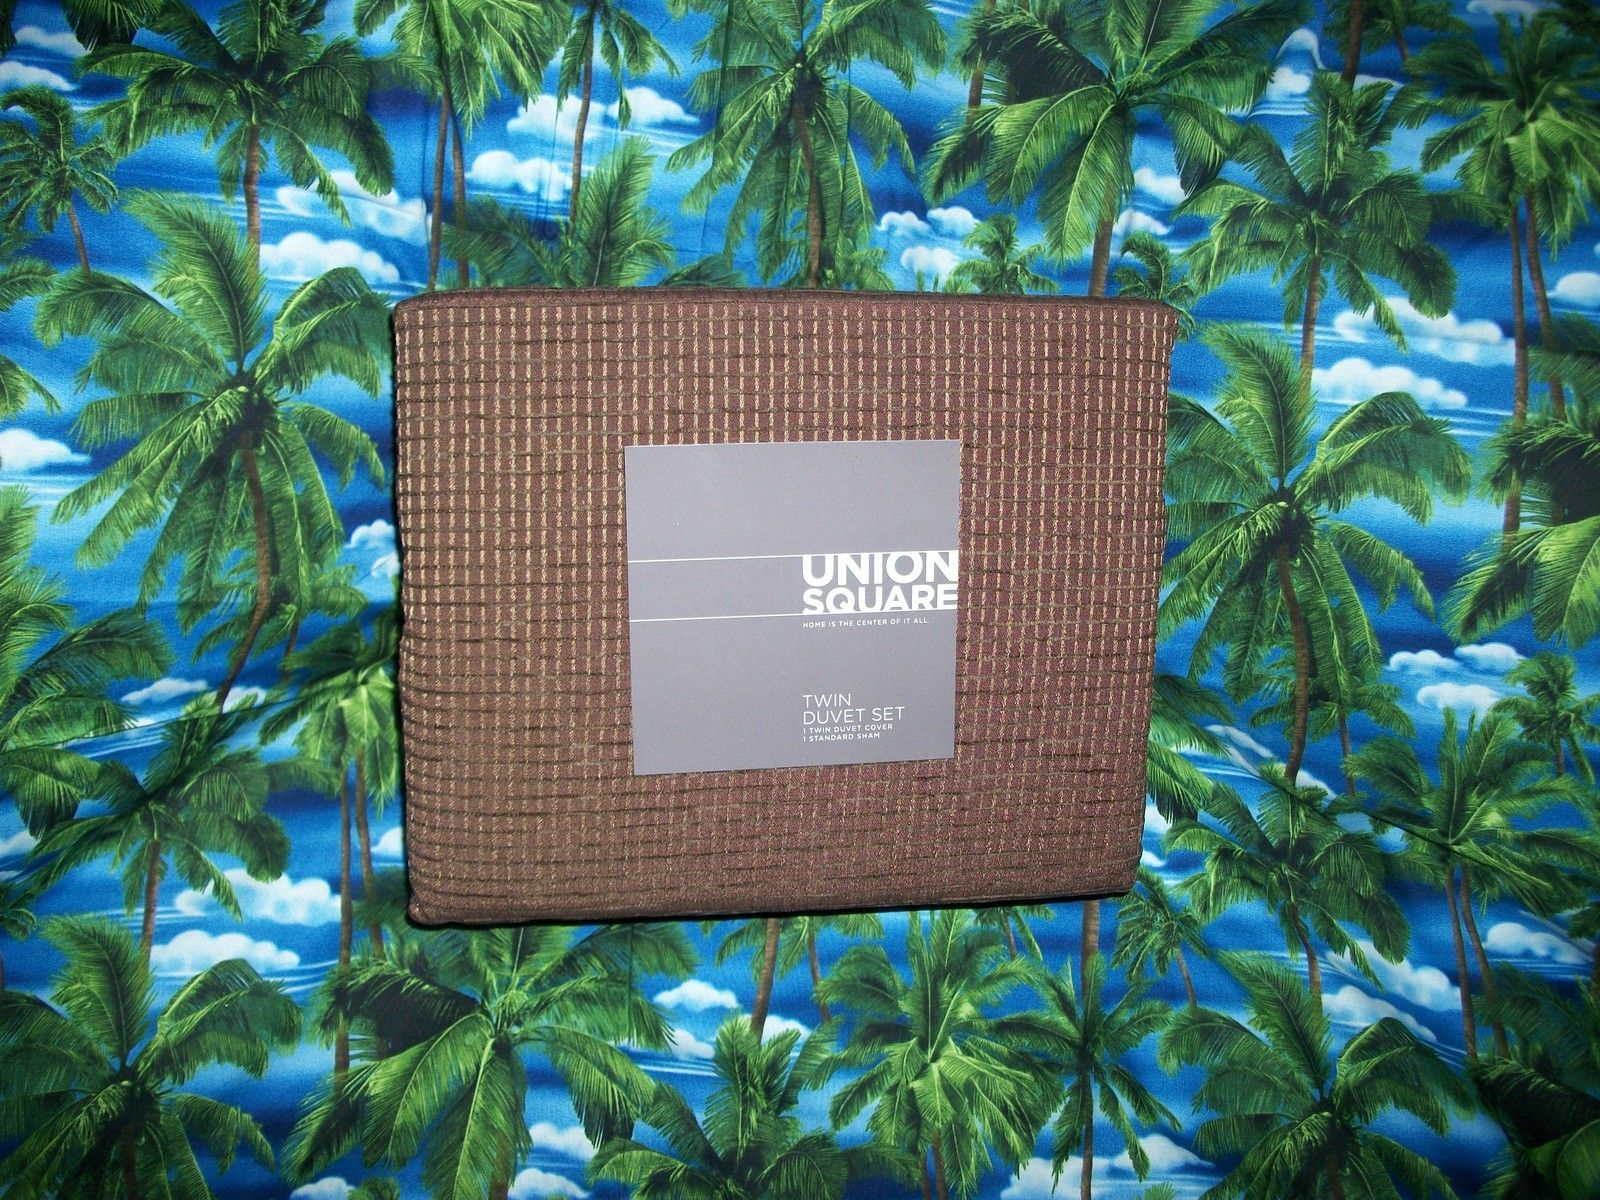 UNION SQUARE CHOCOLATE TWIN DUVET SET NIP